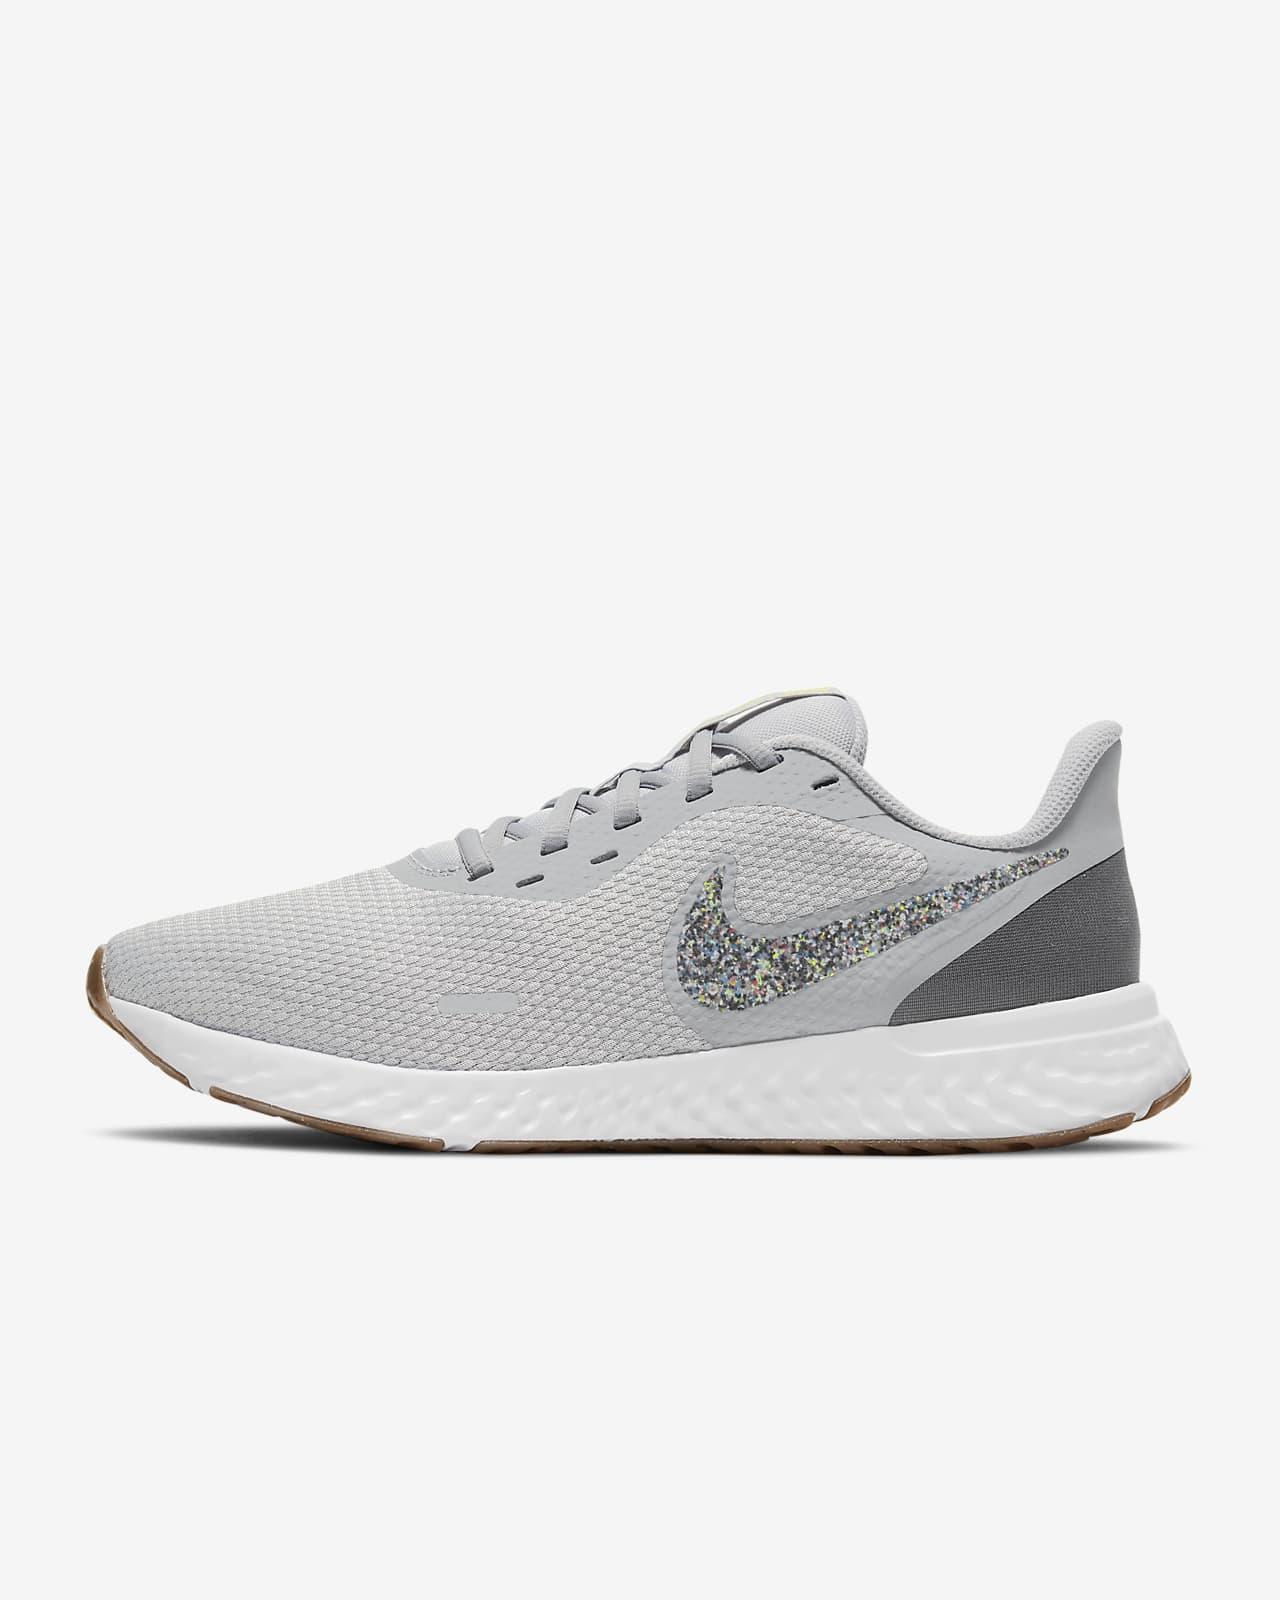 Nike Revolution 5 Premium Men'S Road Running Shoes